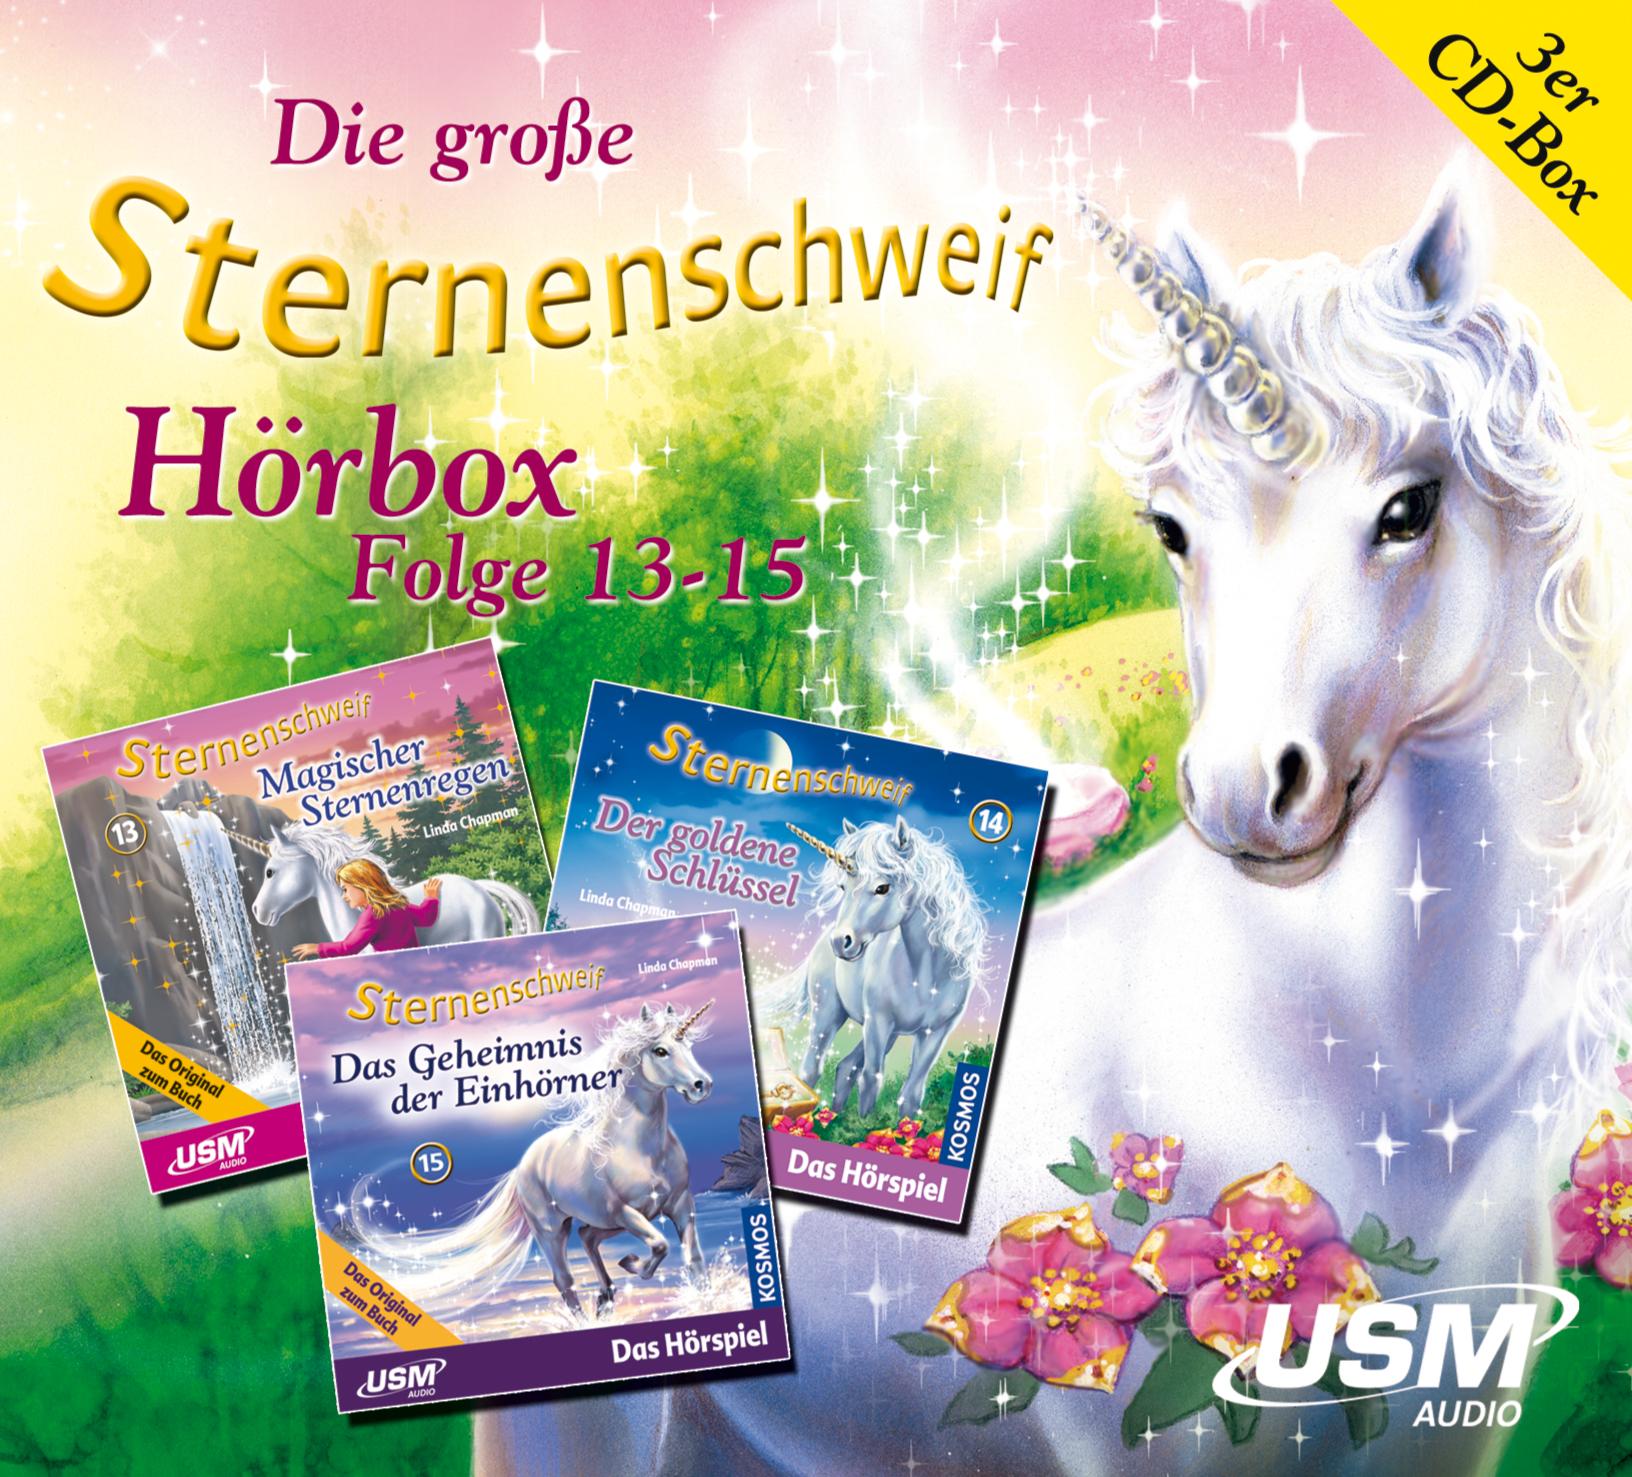 Die große Sternenschweif Hörbox Folge 13-15 - Linda Chapman [3er Audio CD-Box]